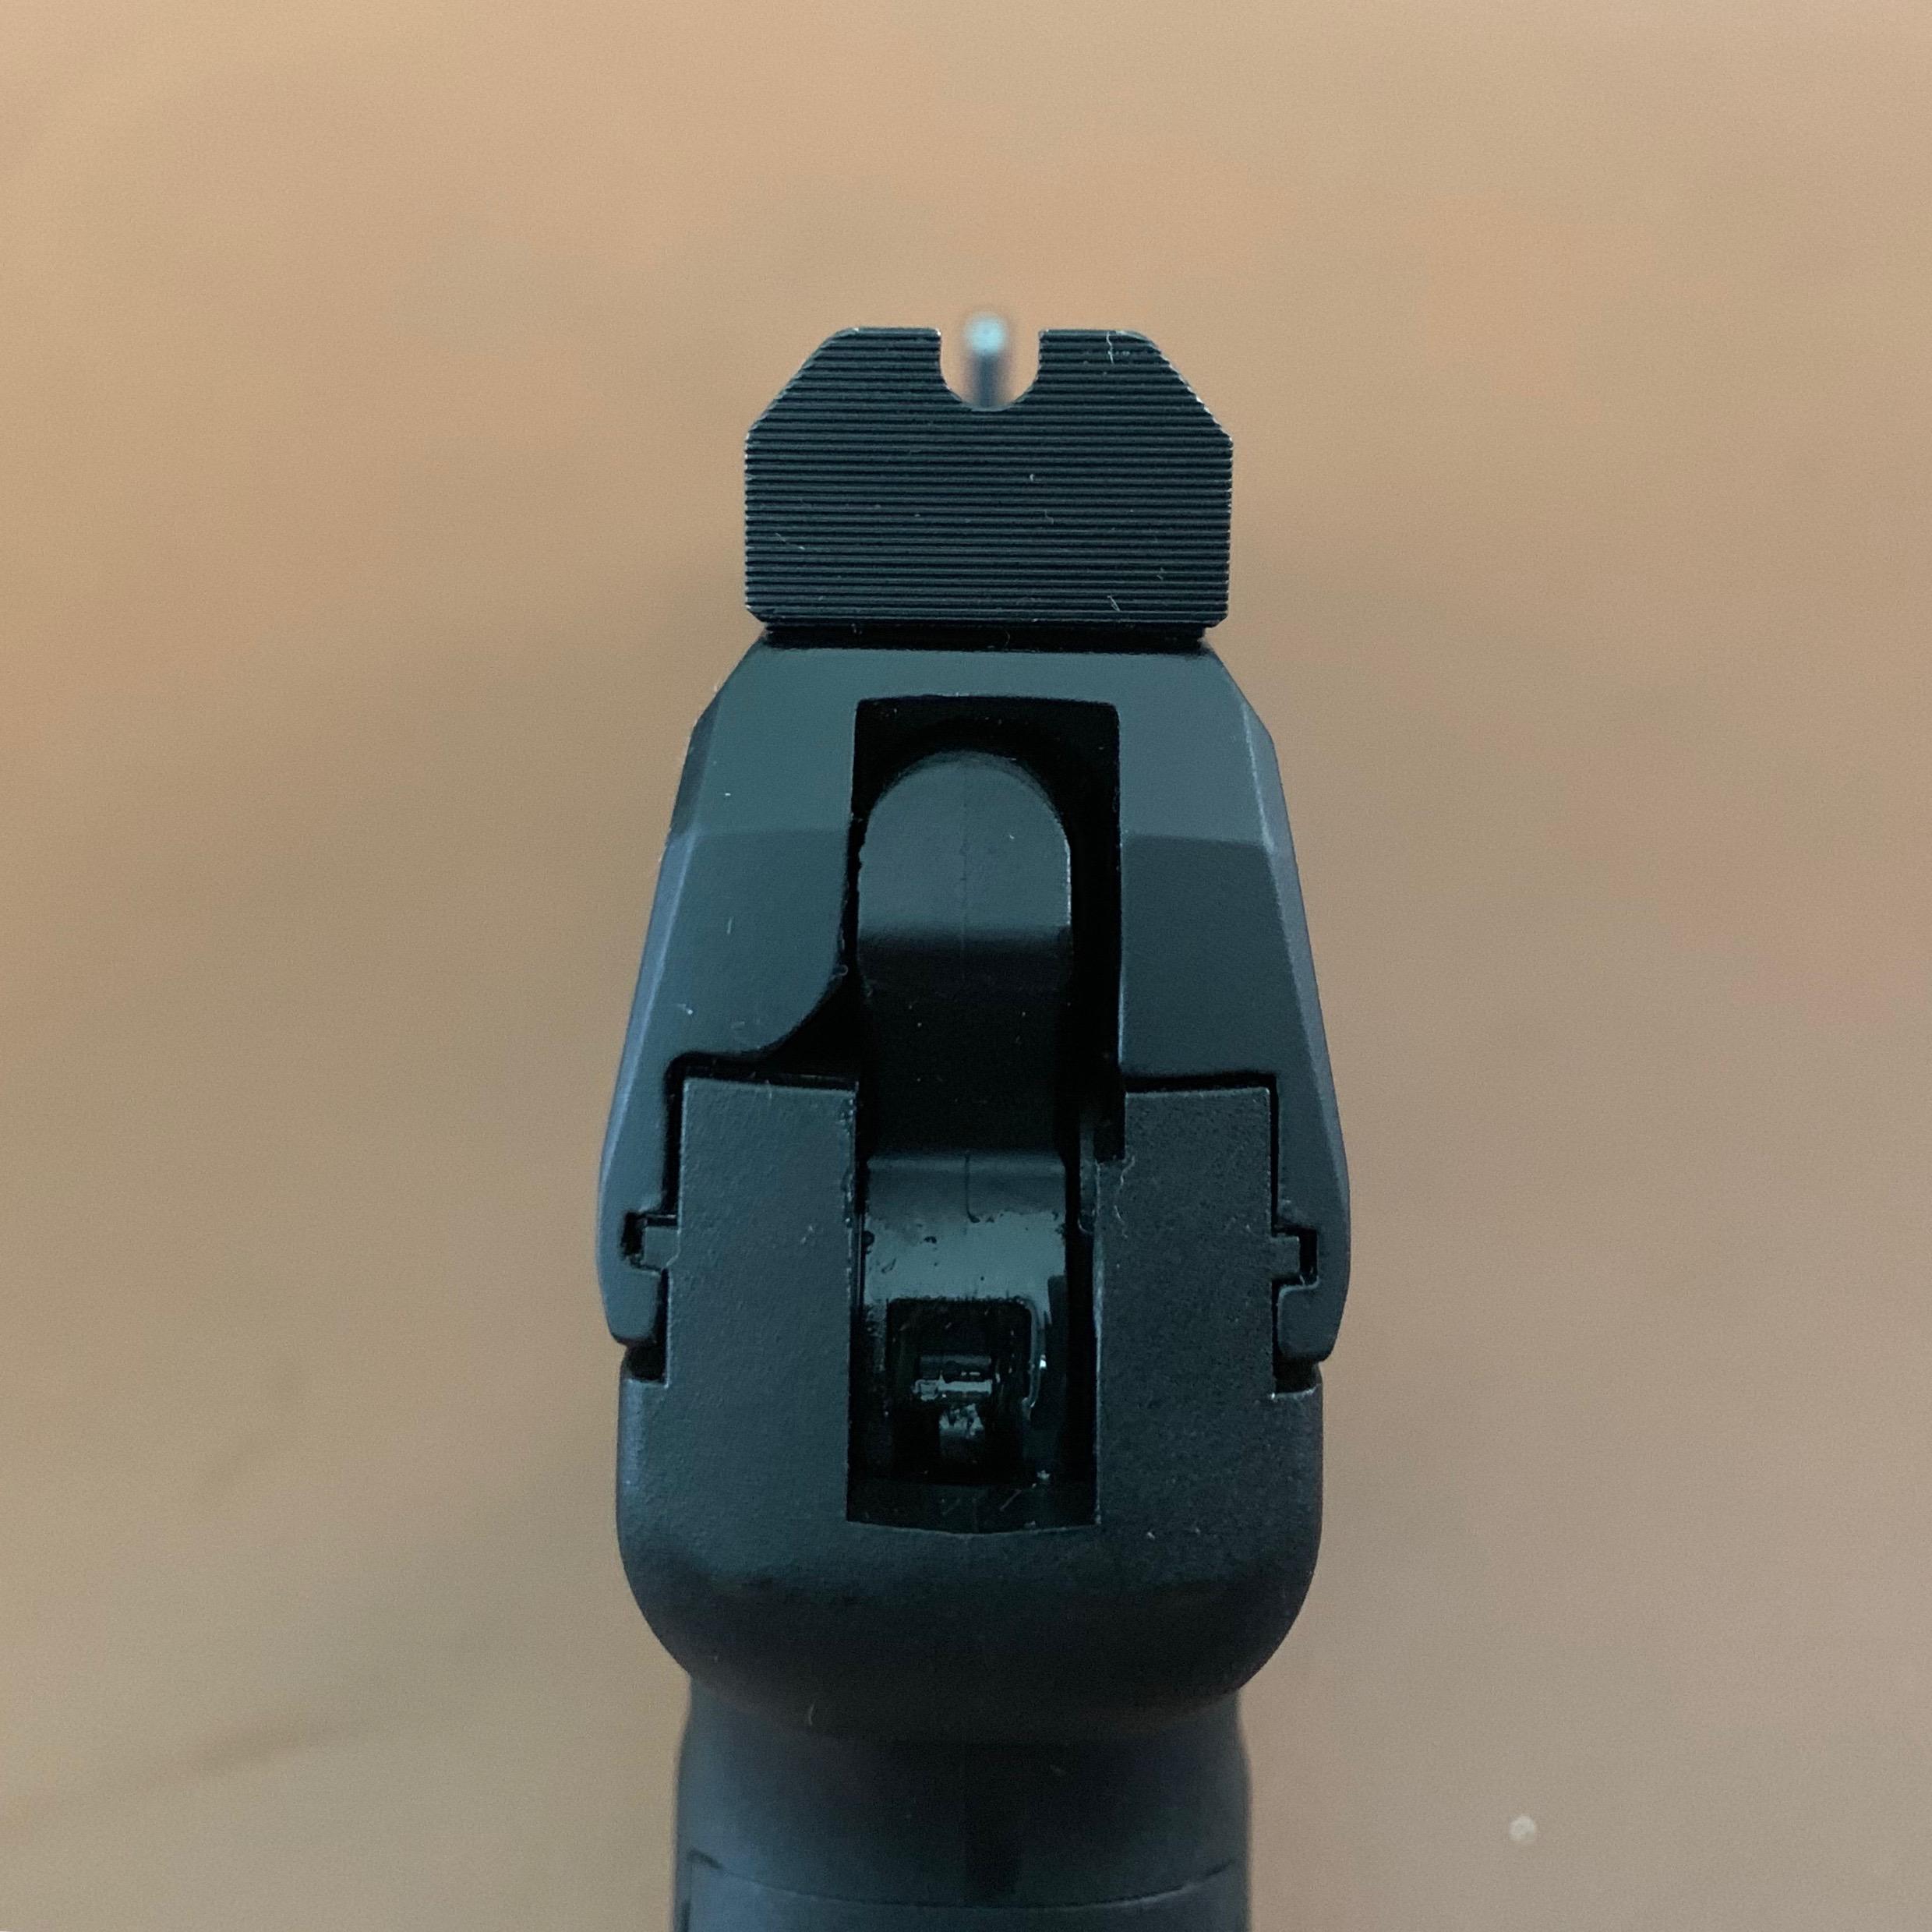 HK45CT Hammer Off Center-hk45ct_hammer.jpeg